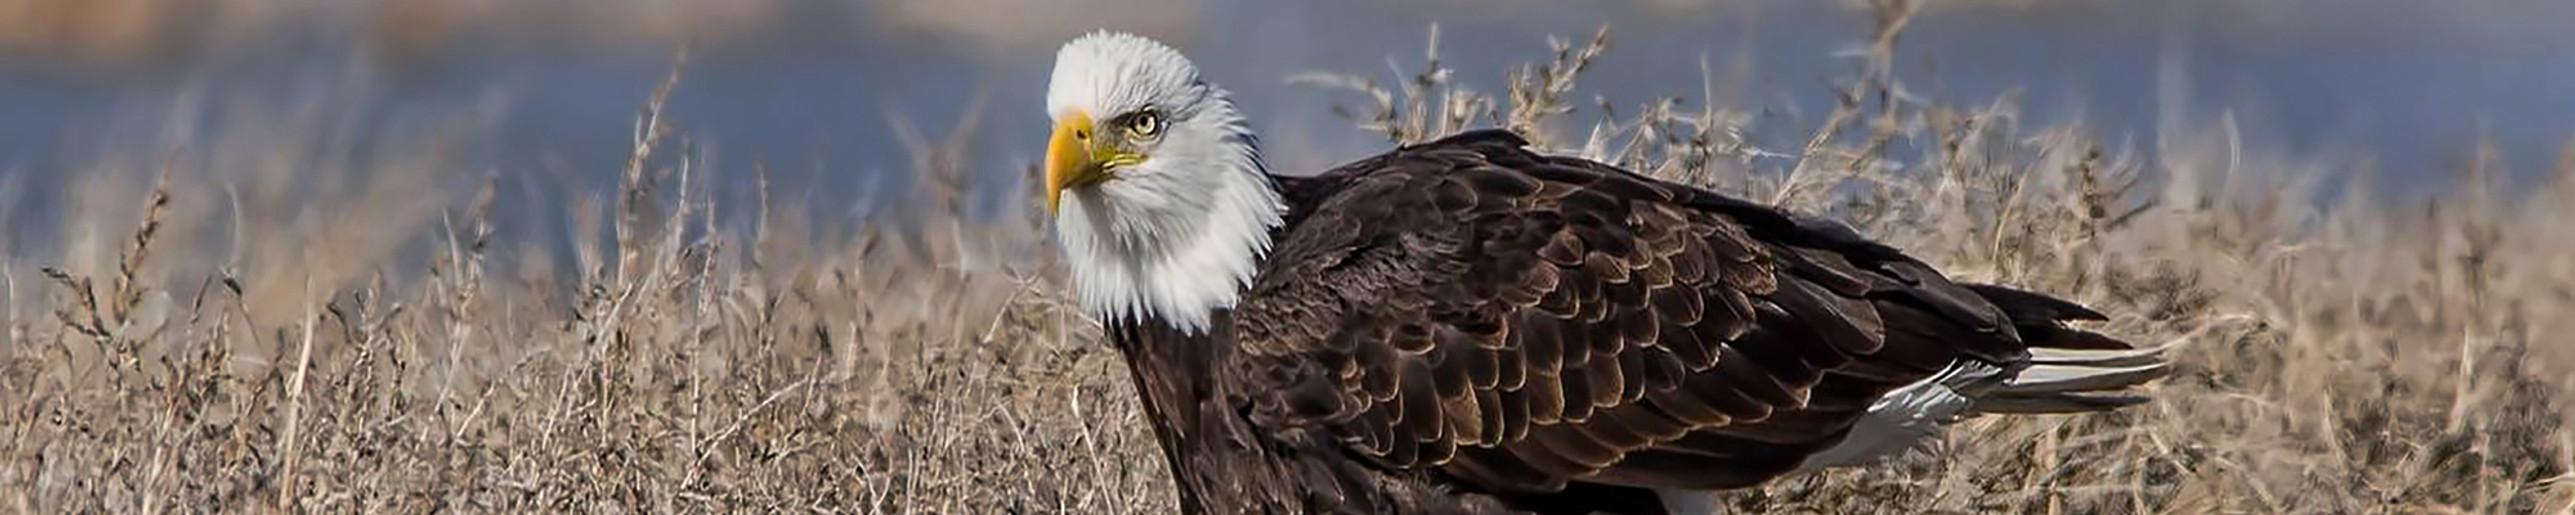 walking eagle2.jpg